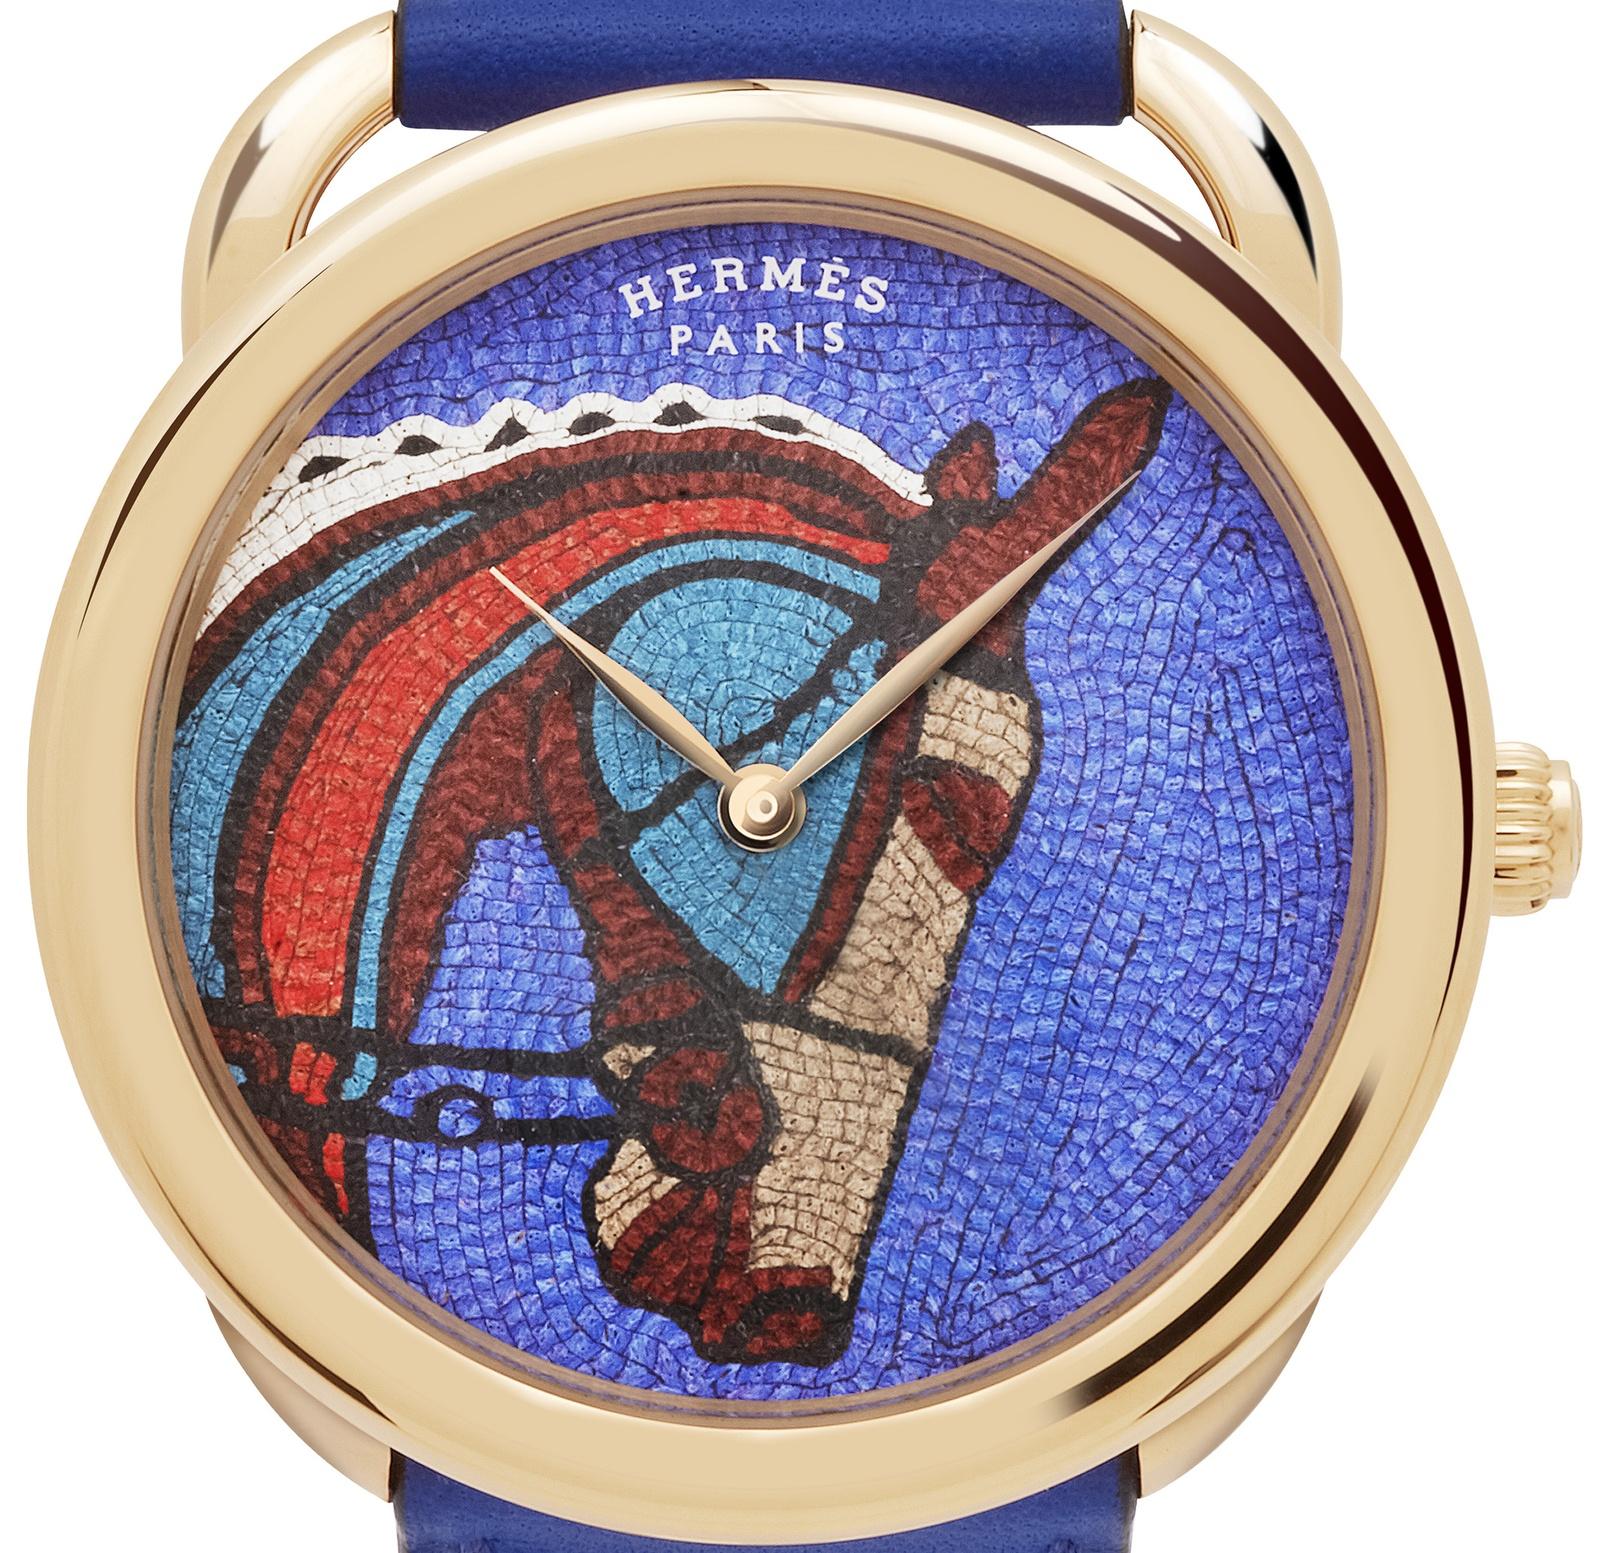 Hermes Arceau Robe du Soir dial close up